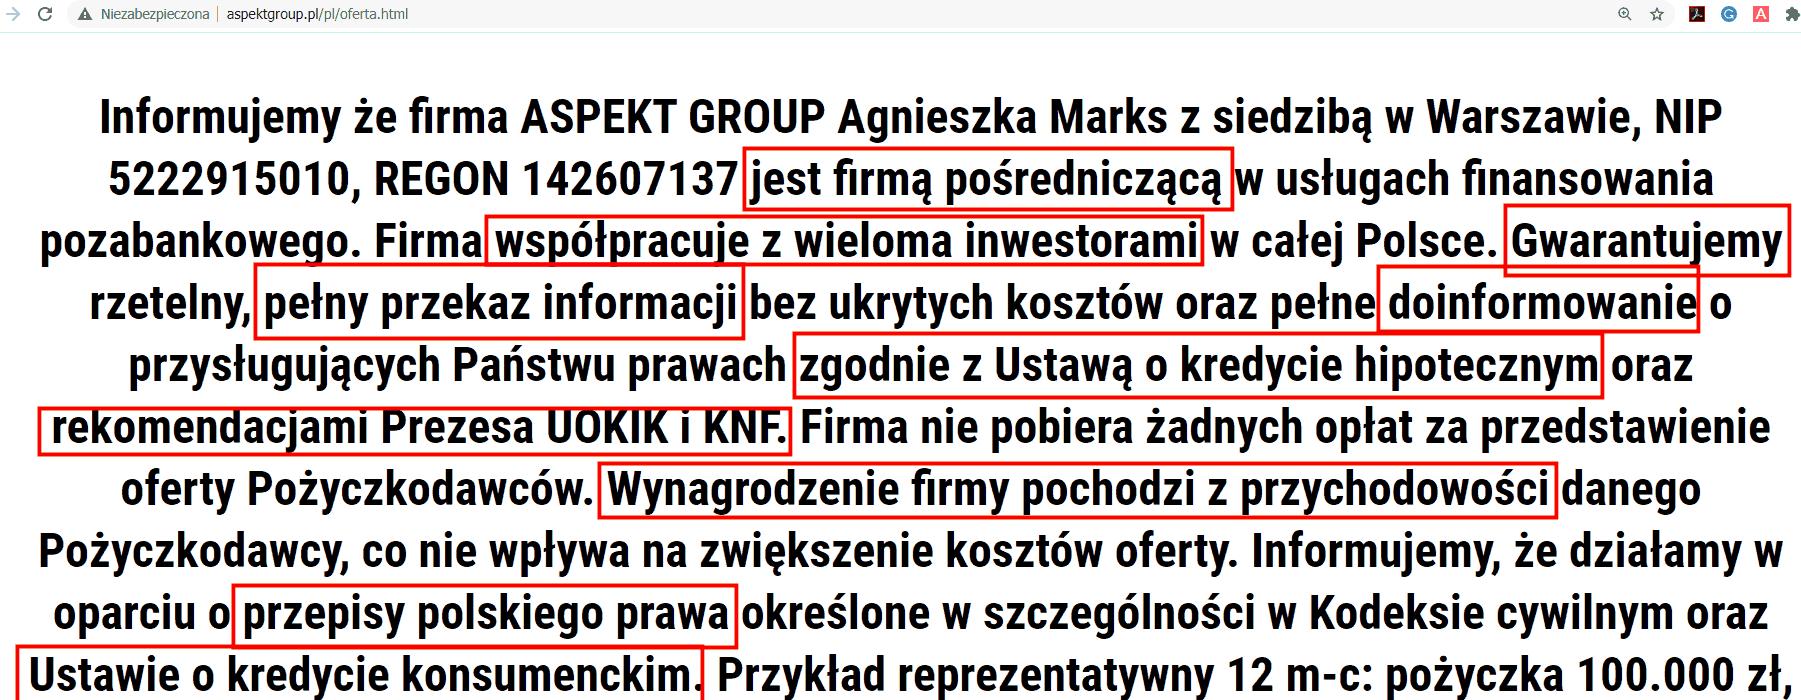 Stopka Aspekt Group